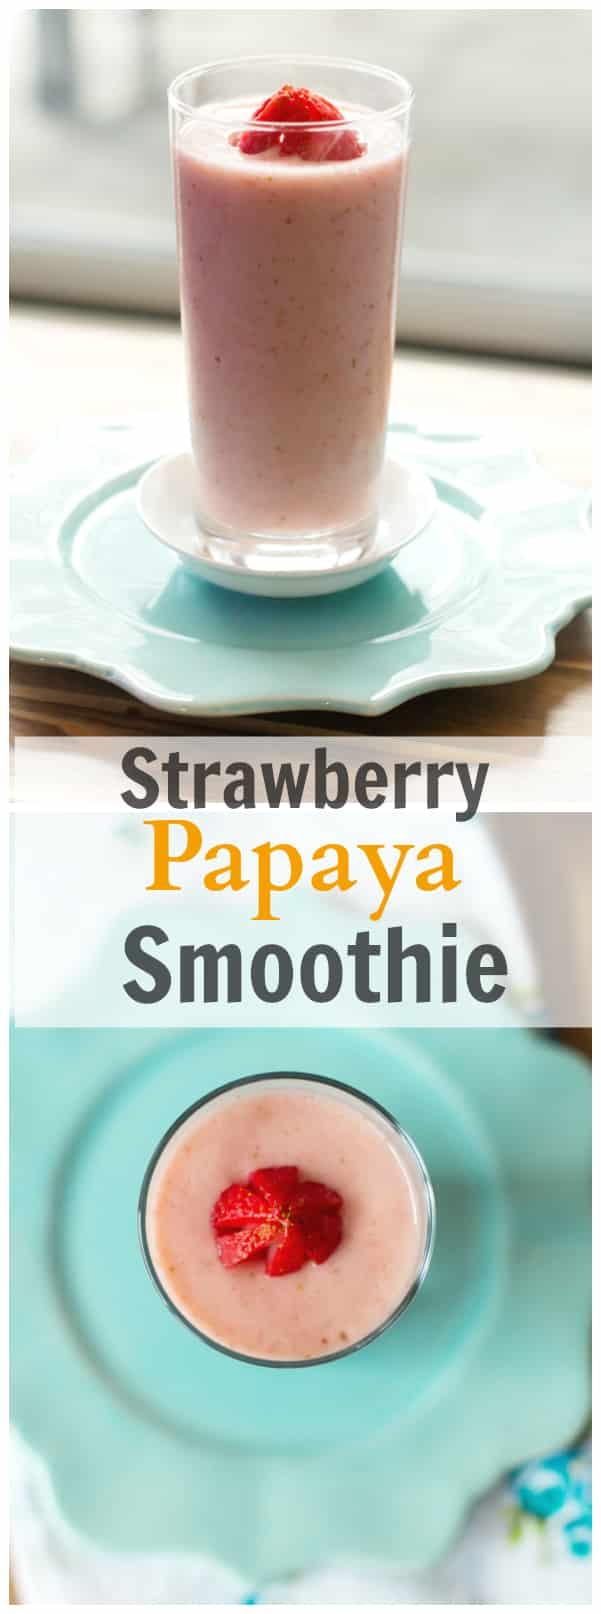 strawberry papaya smoothie